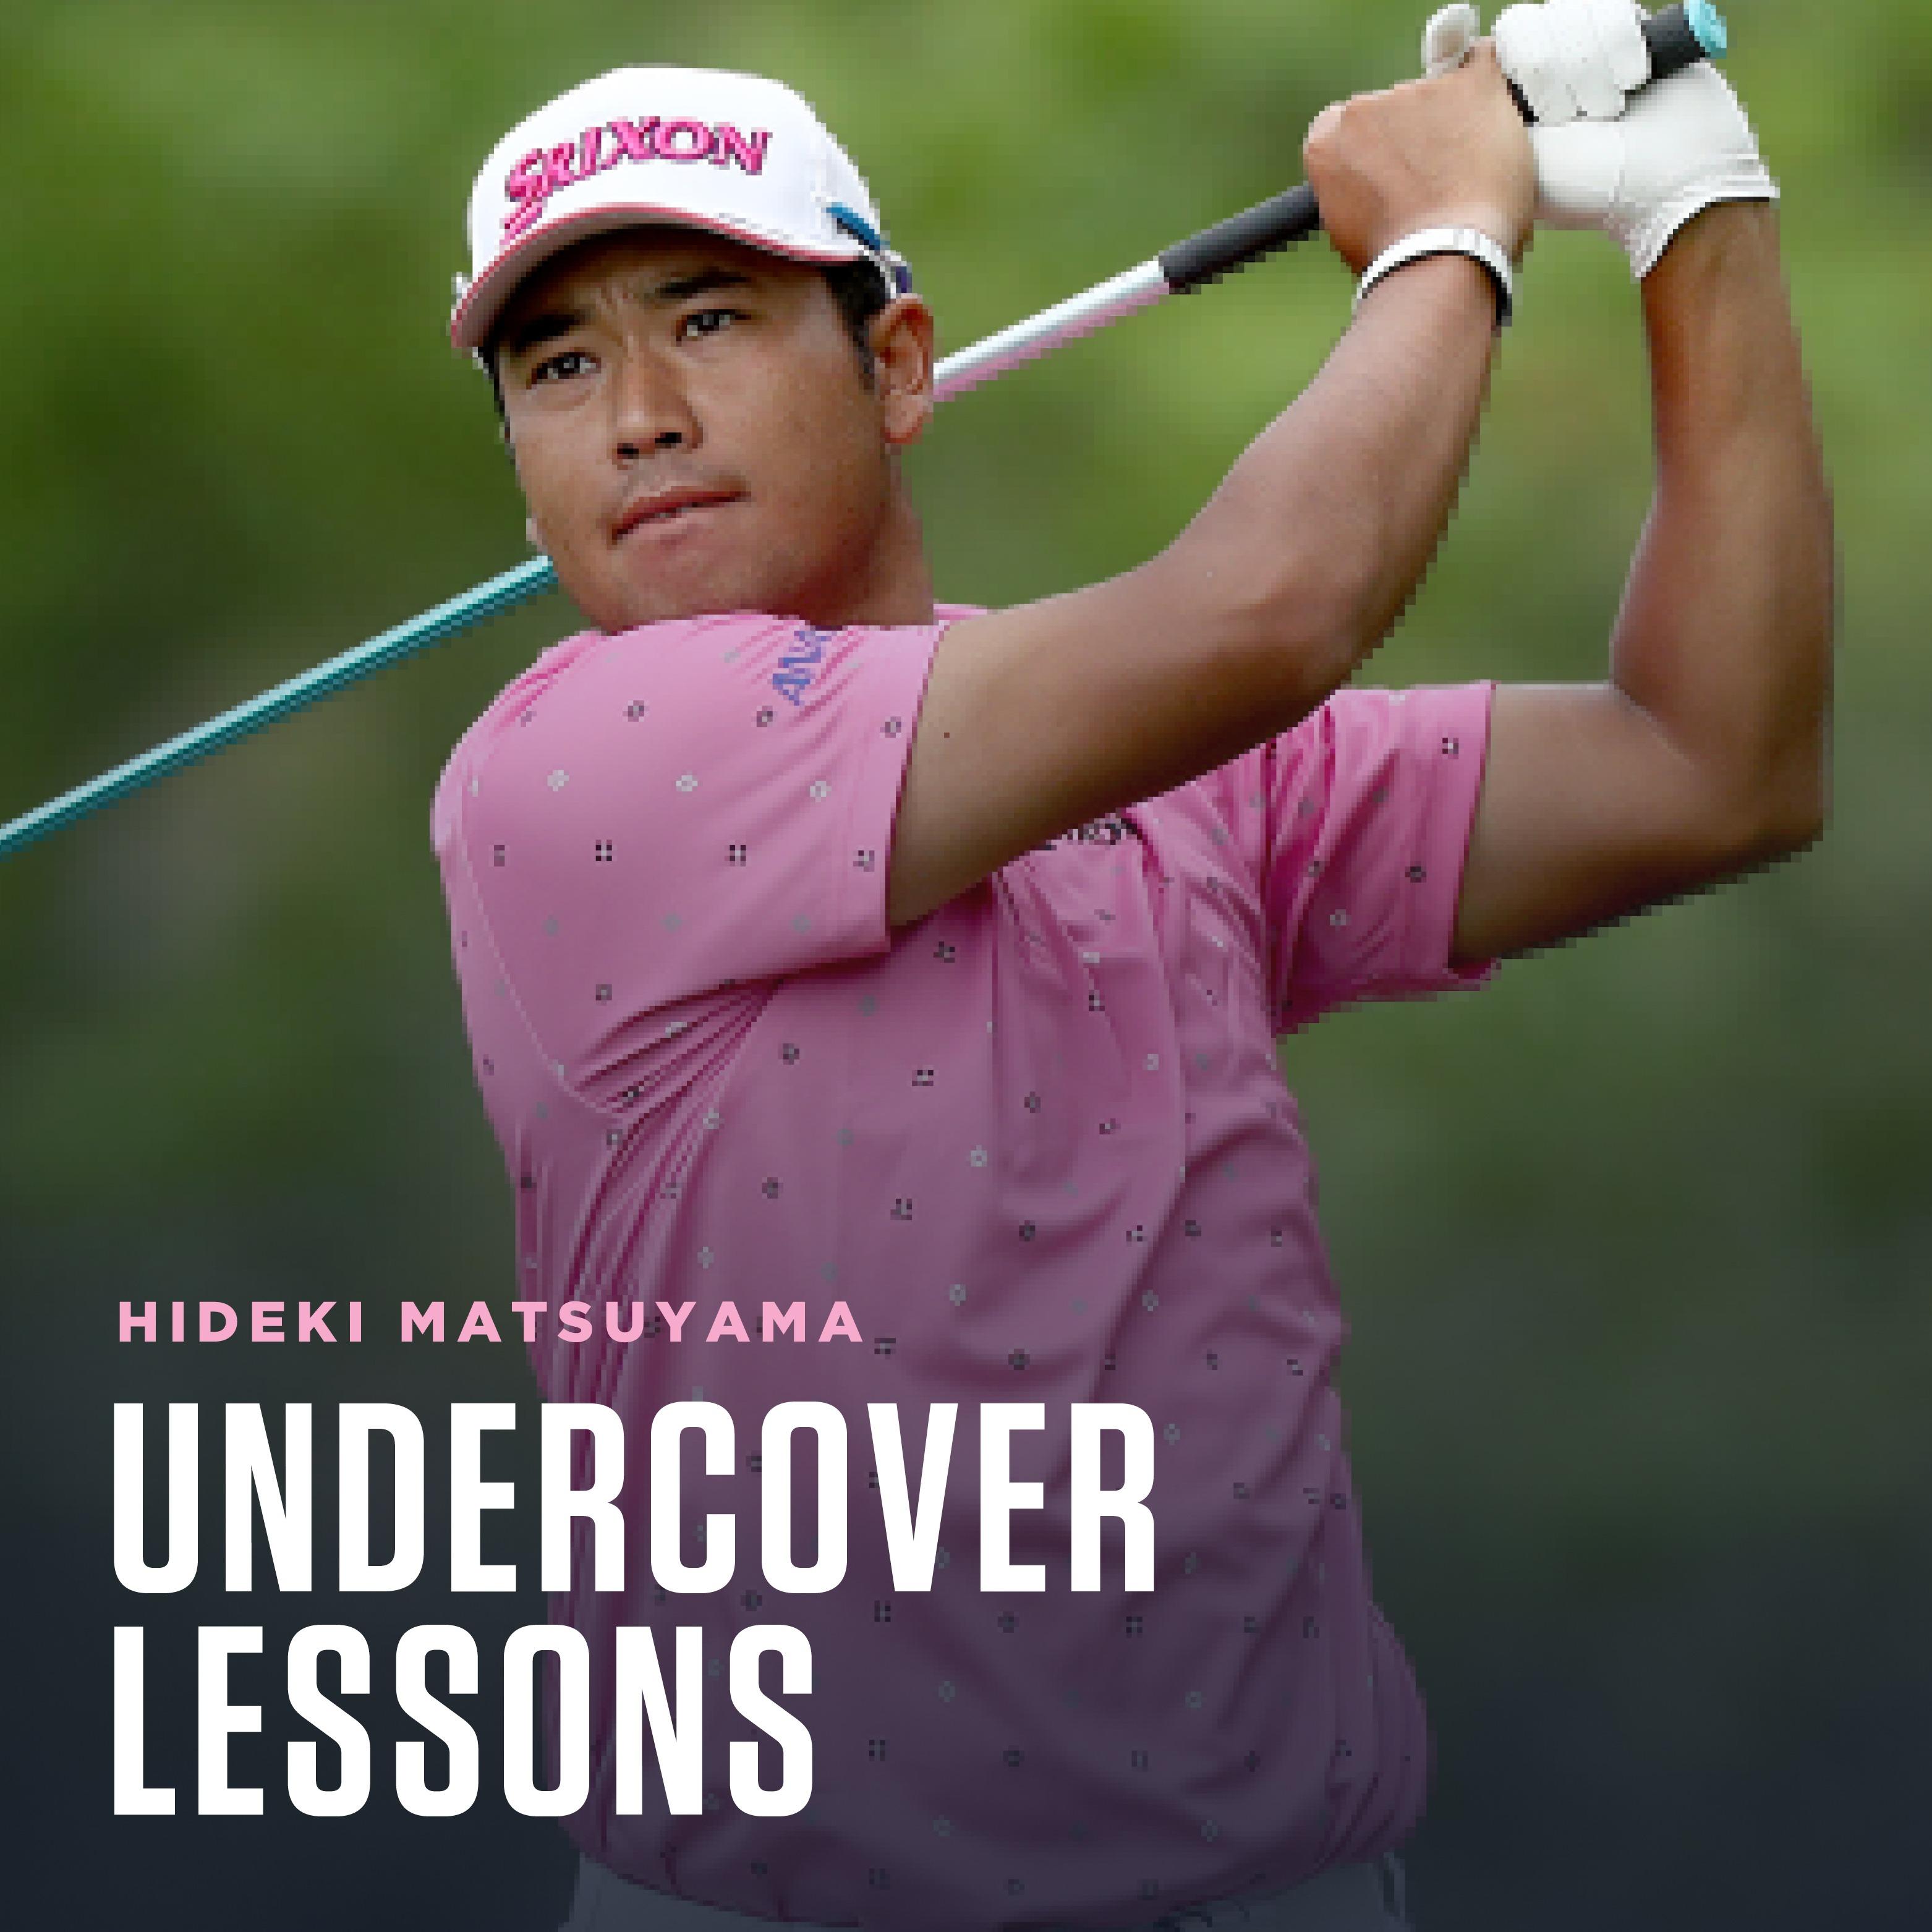 Undercover Lessons Matsuyama